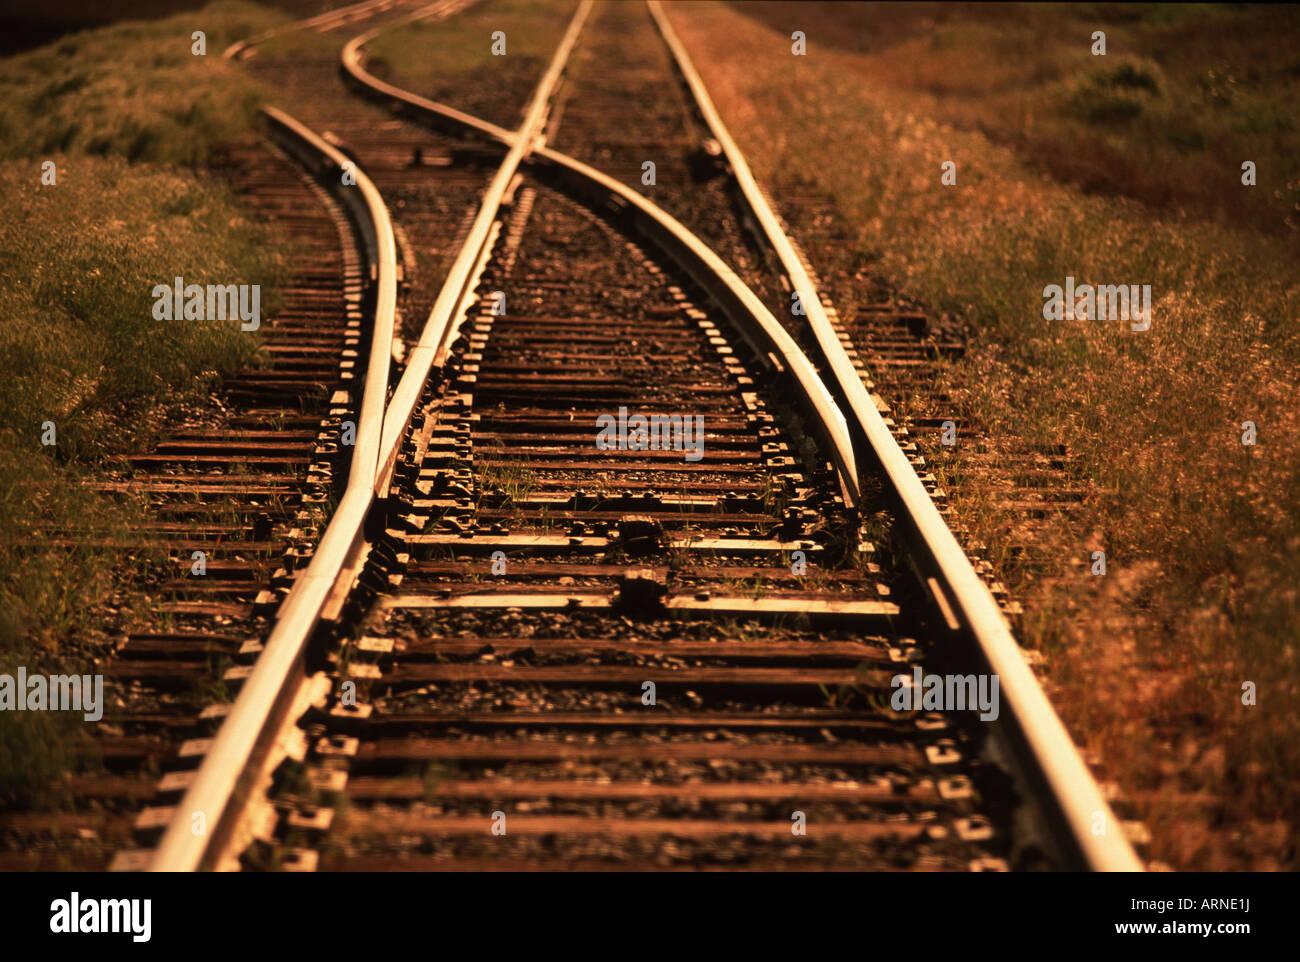 Train Tracks Konvergenz, Britisch-Kolumbien, Kanada. Stockbild